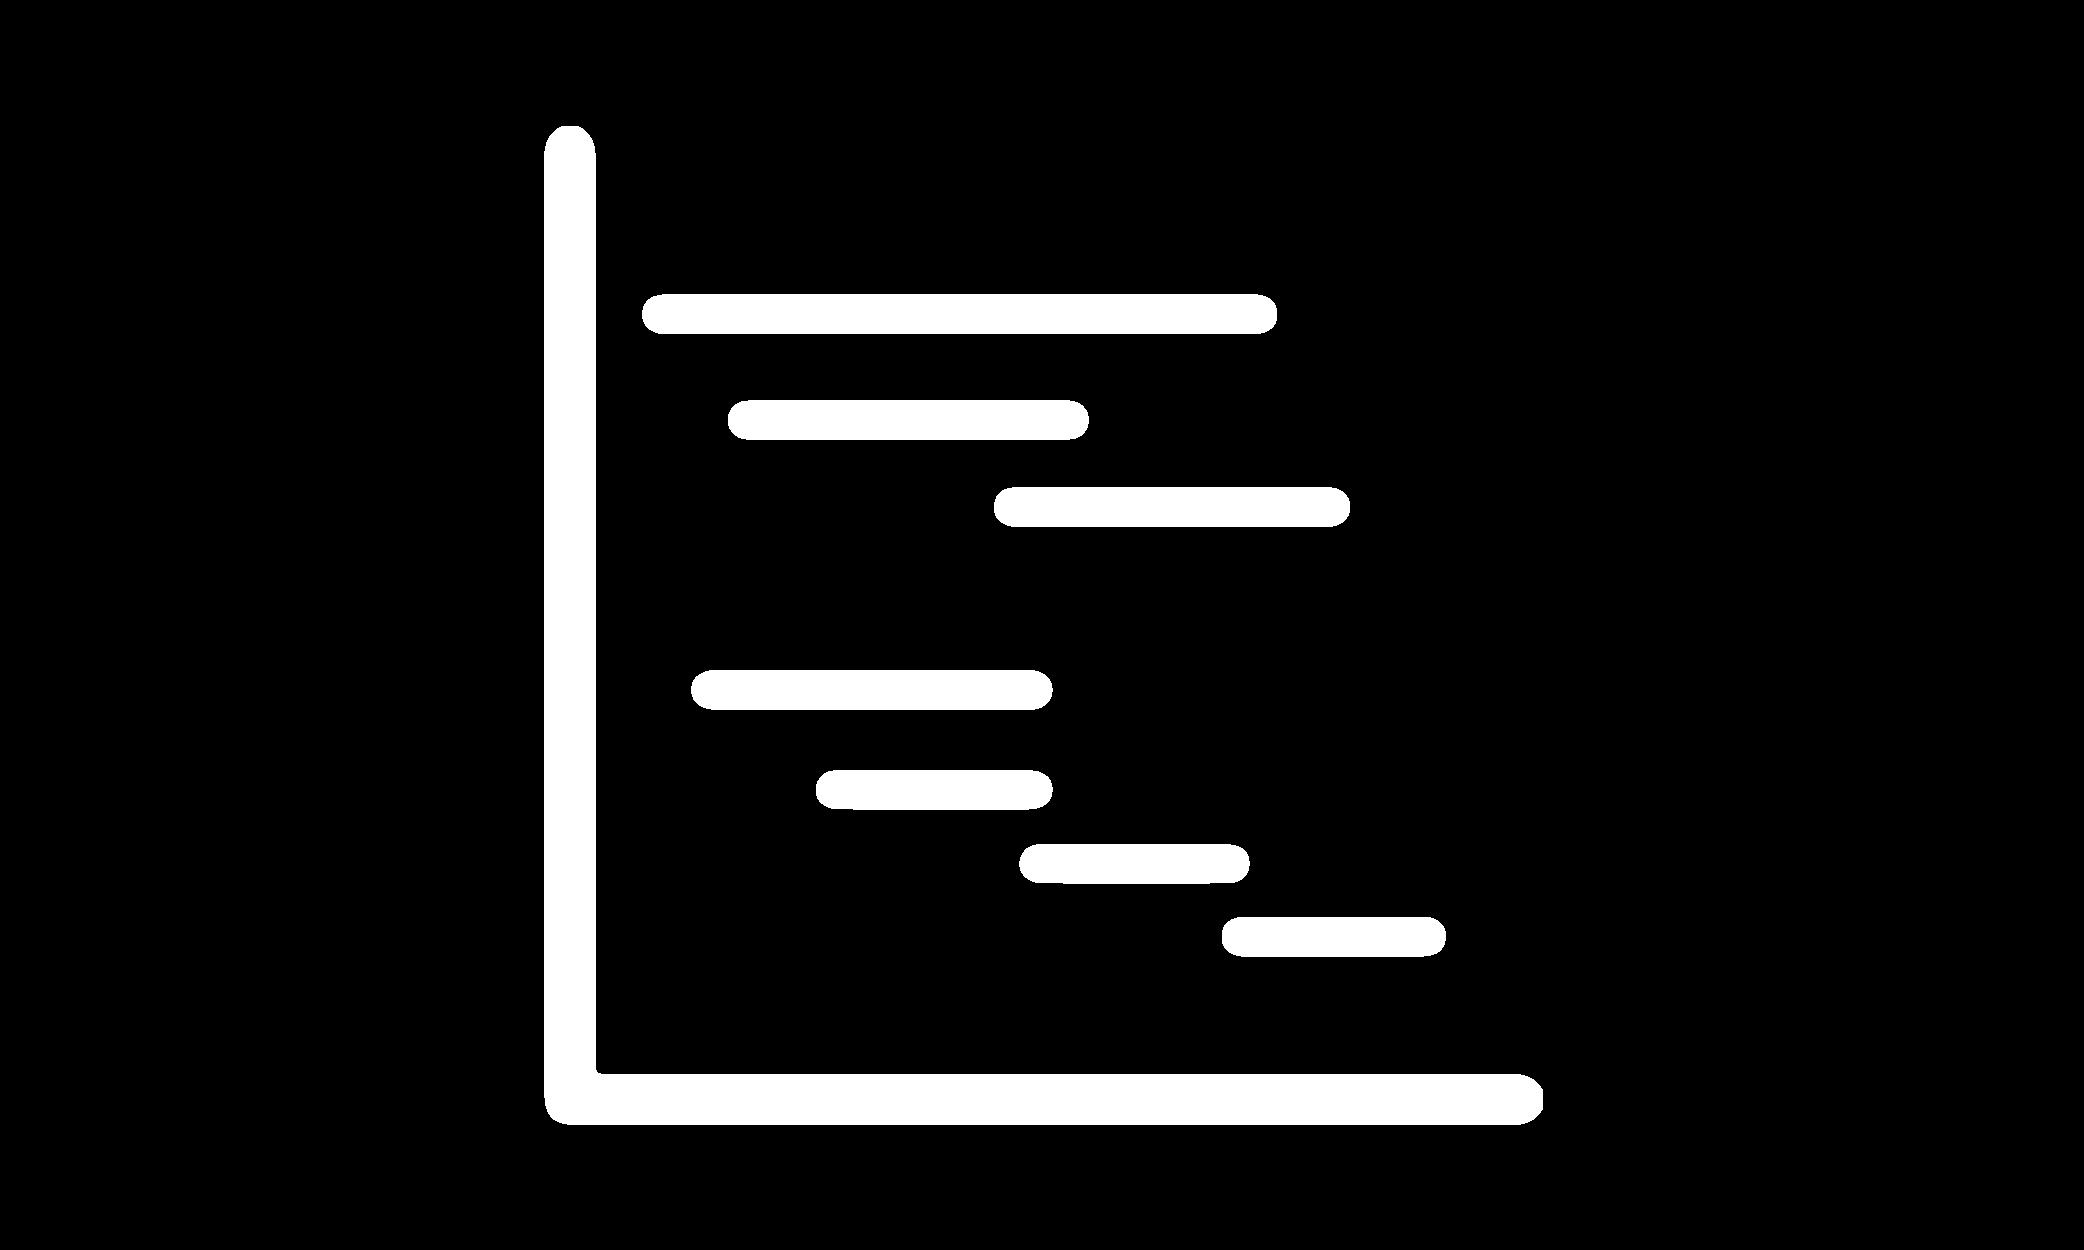 icon gantt chart